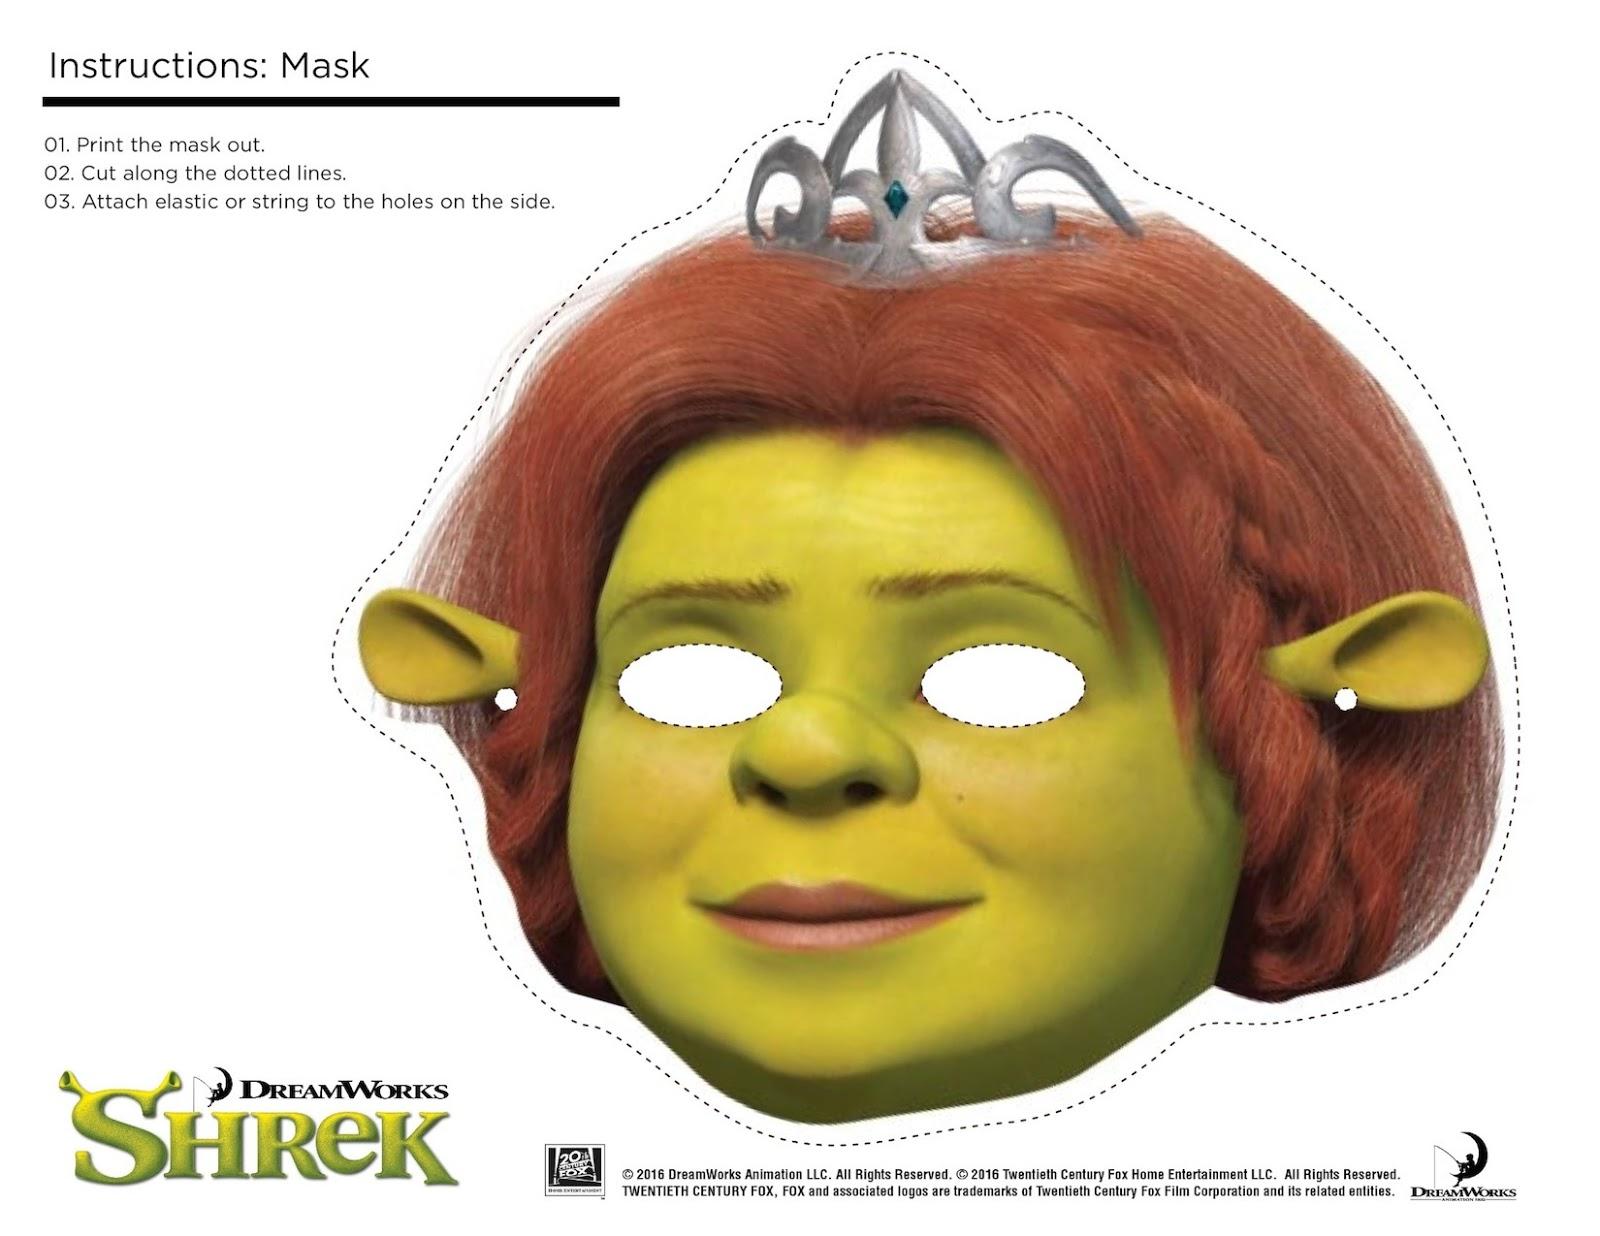 Shrek Photo Booth Props + Print Free Printable Shrek Mask - Fun Things ...